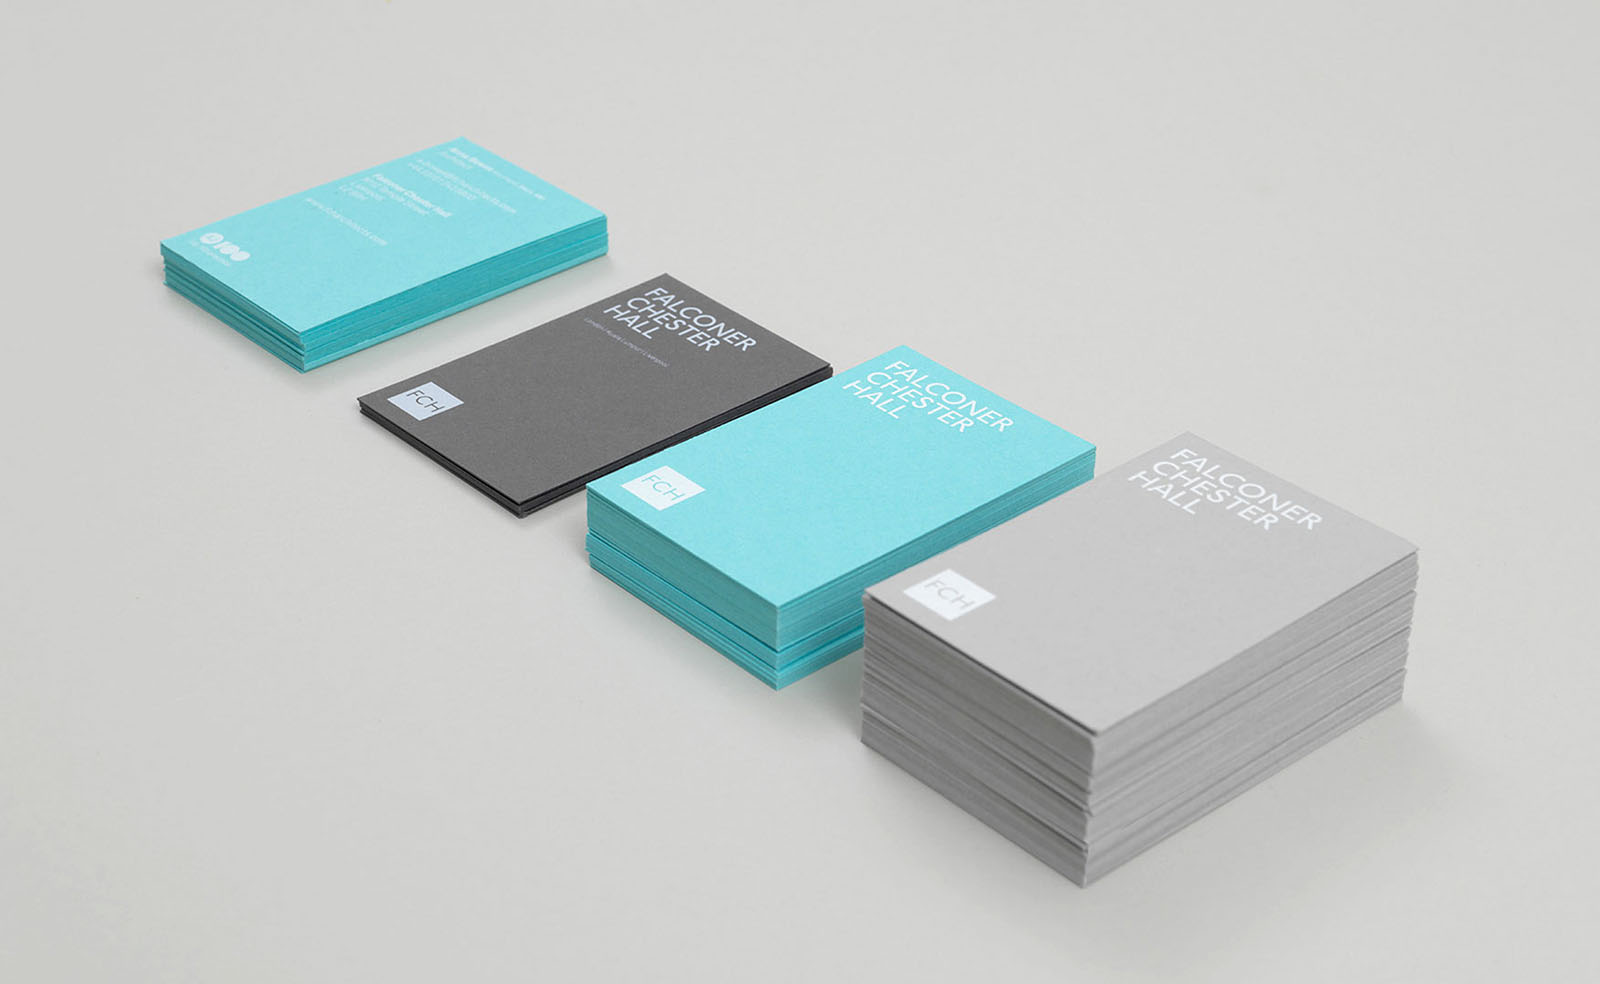 falconer chester hall business cards design by Leeds based Freelance Designer Neil Holroyd